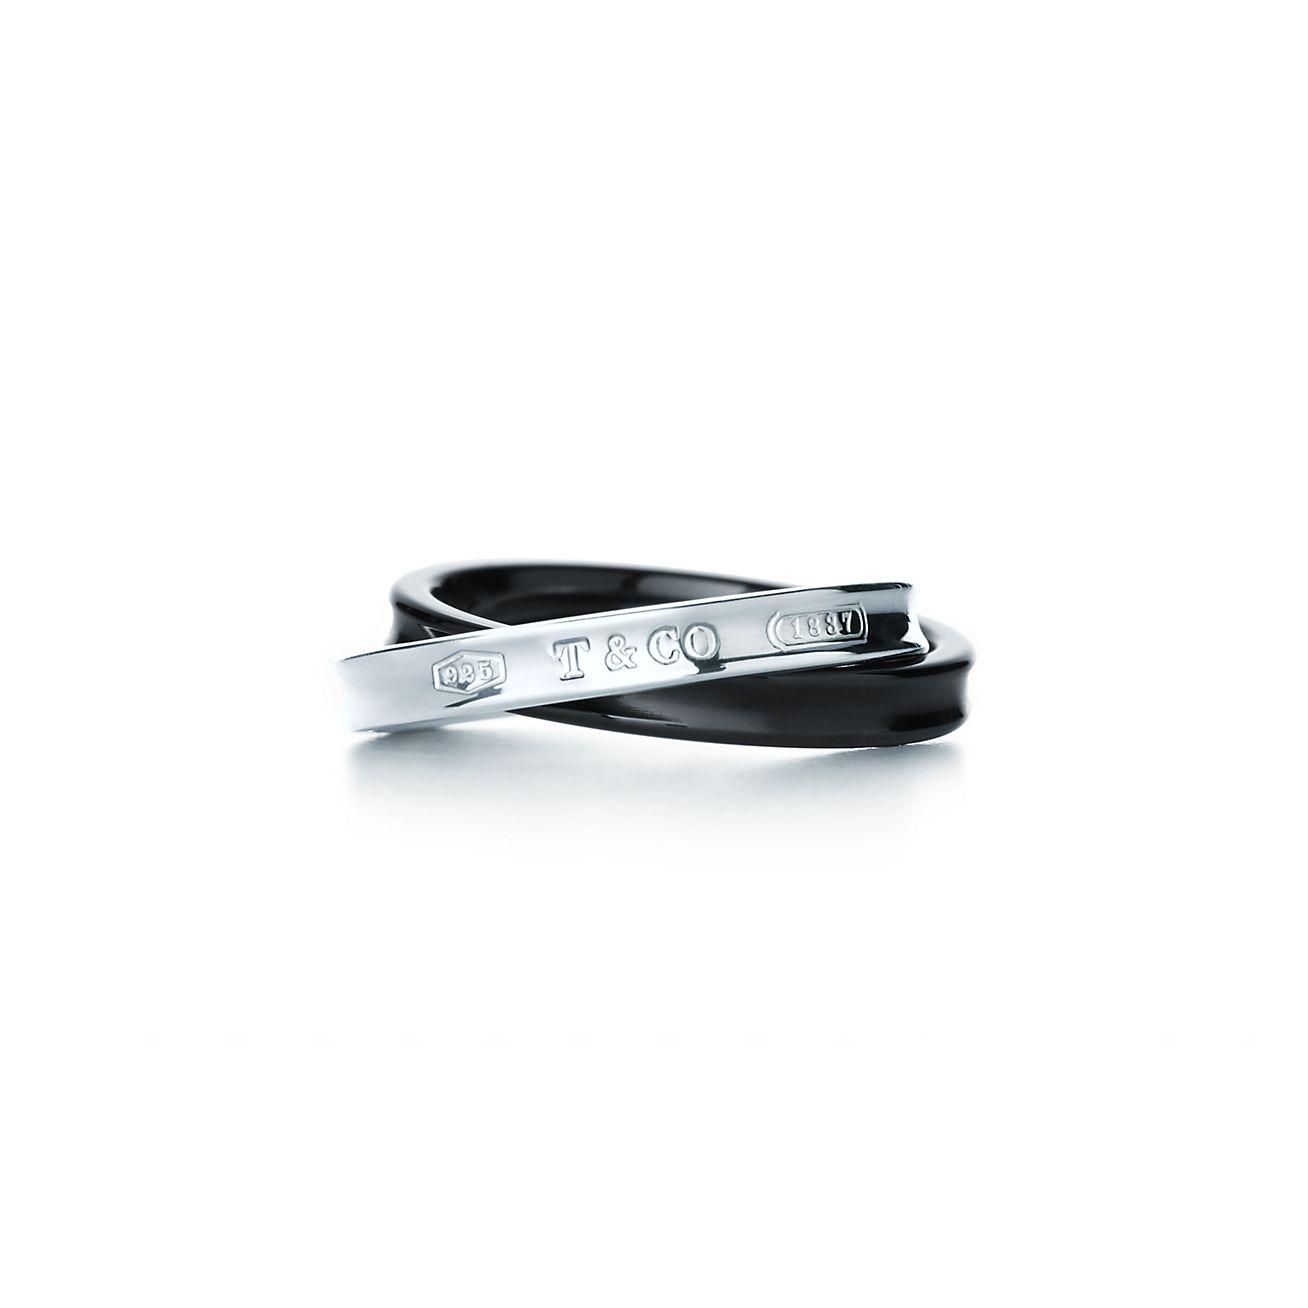 Tiffany 1837 interlocking circles ring in sterling silver - Size 6 Tiffany & Co.